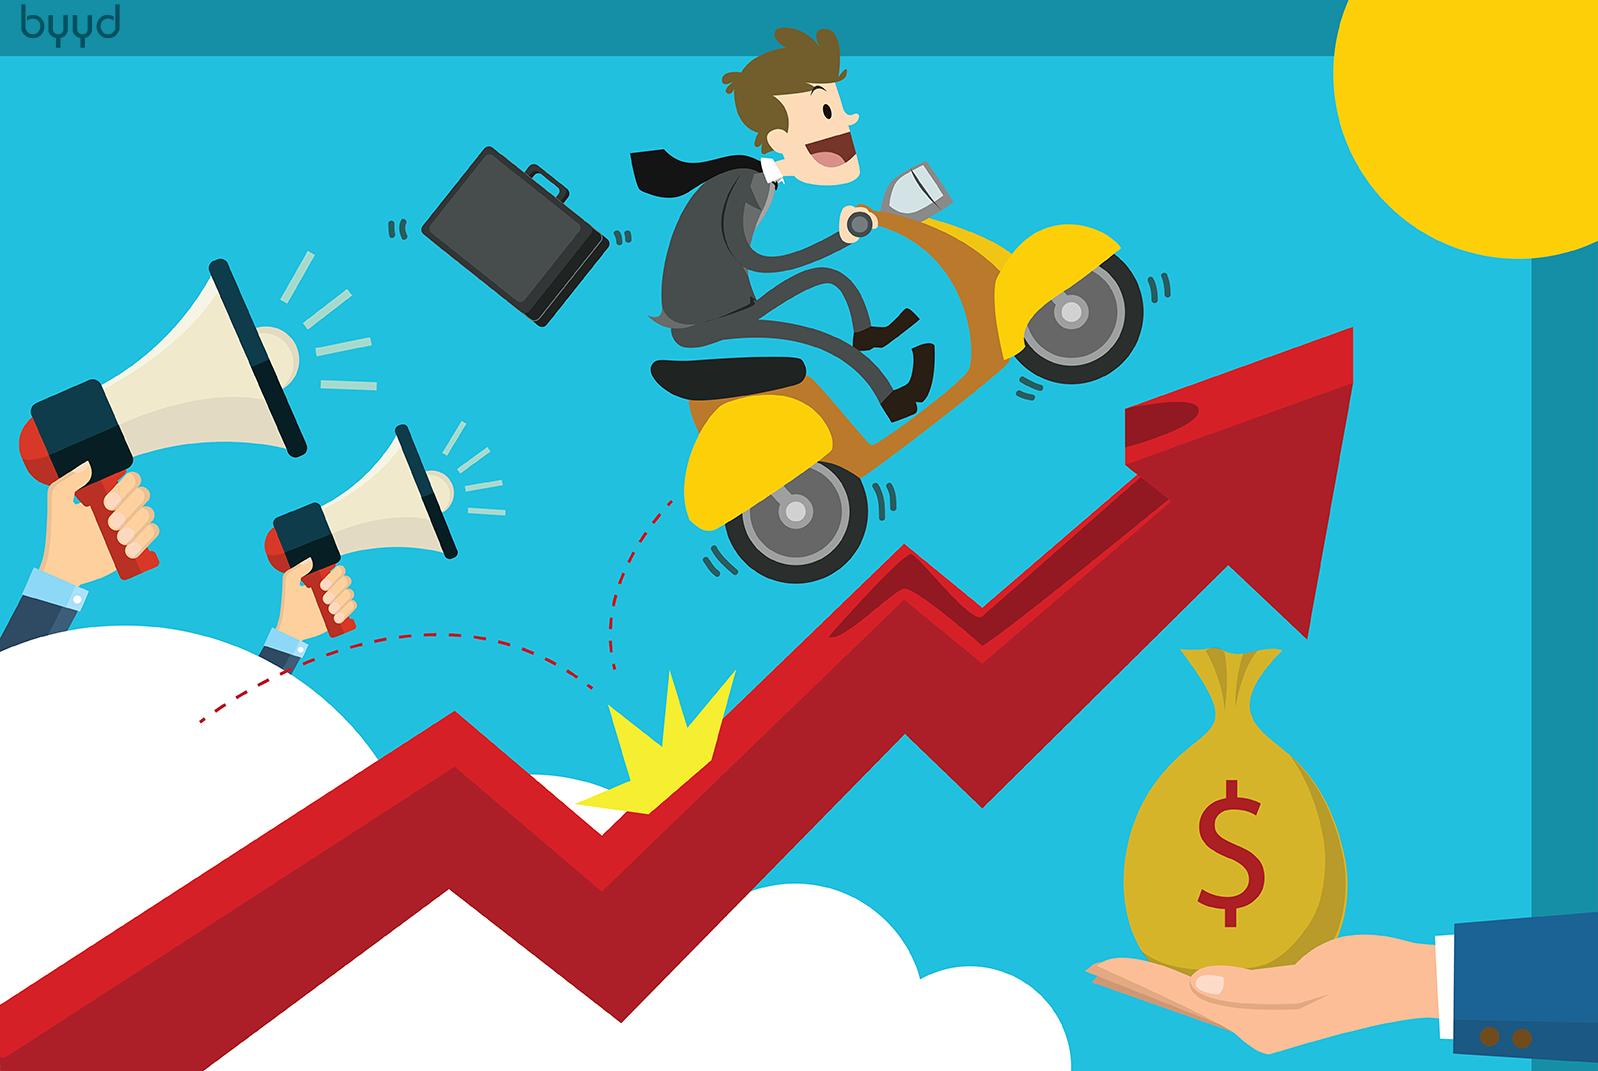 К 2018 расходы на медийную рекламу вырастут до $710 млрд - 1